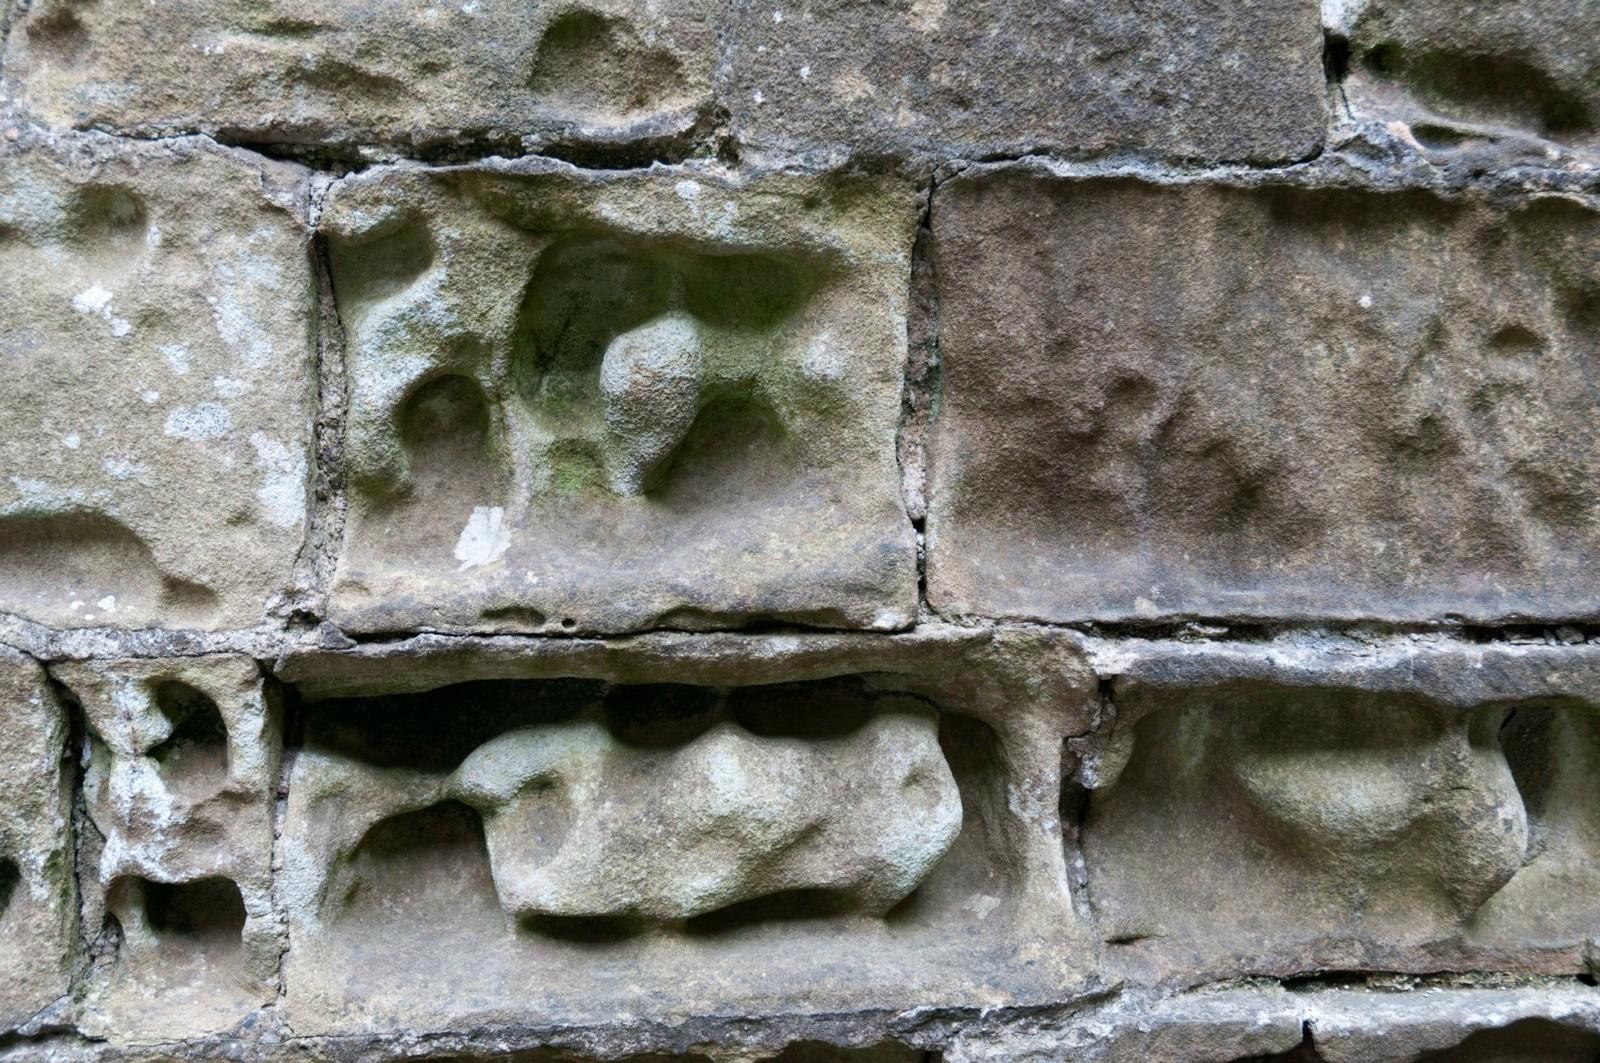 Limestone bricks weathered by acidic rain